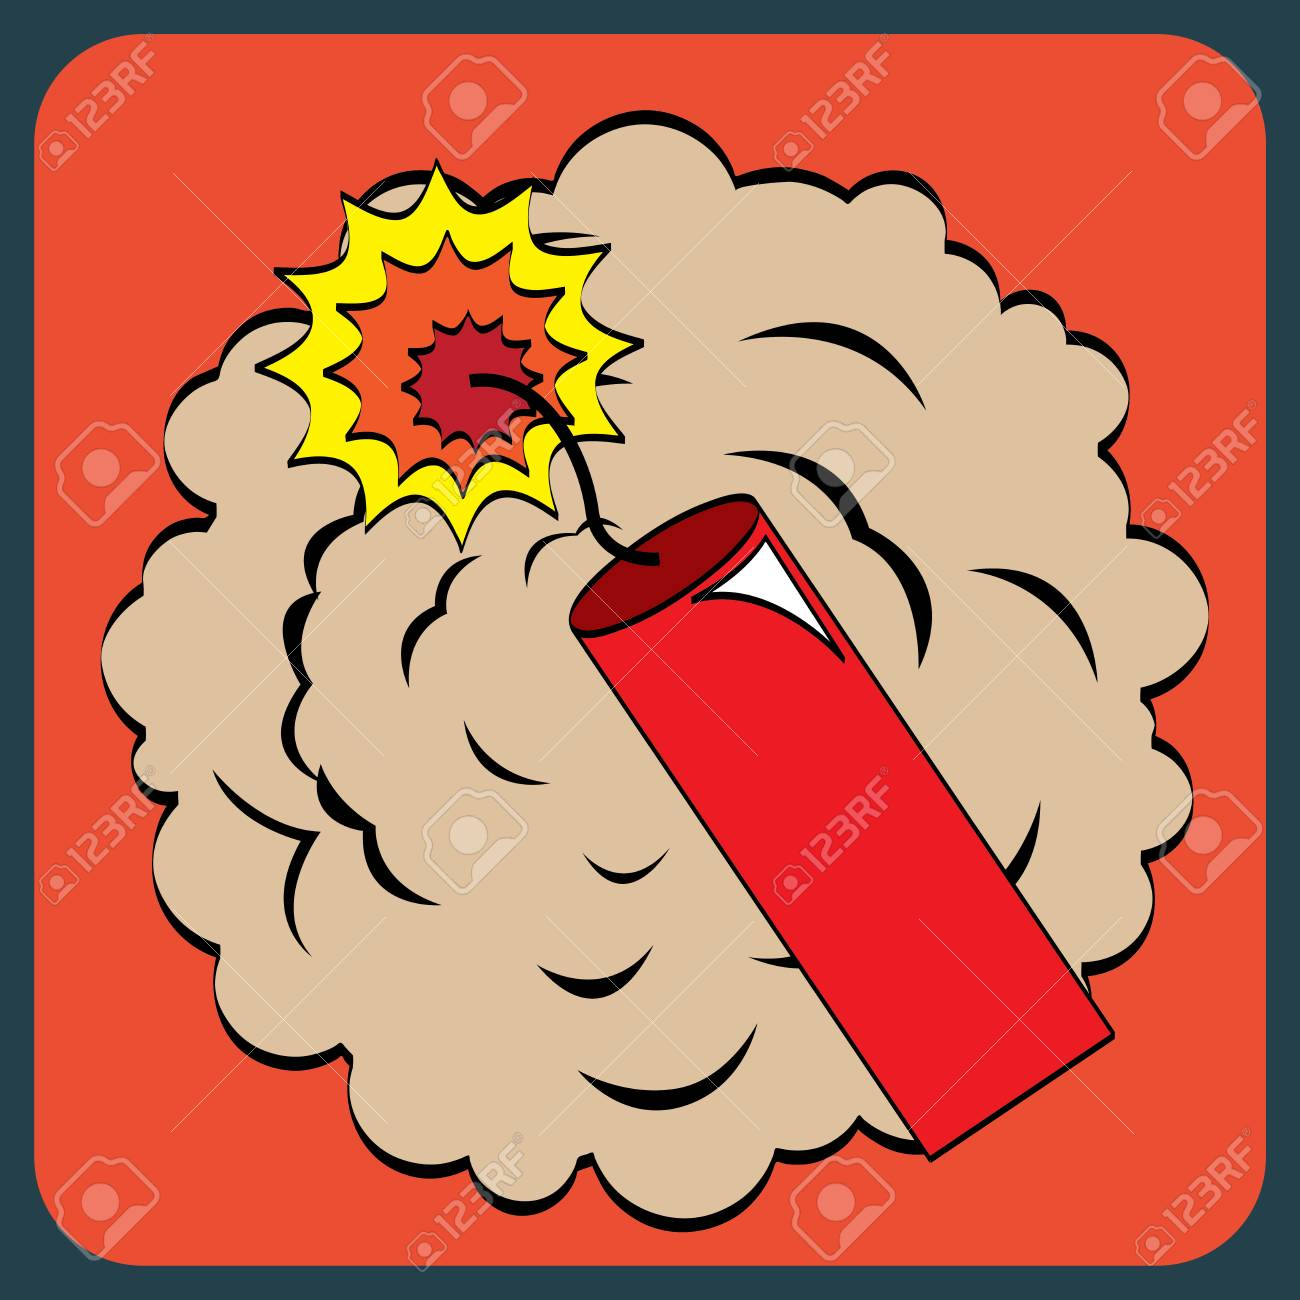 pop art design over red background vector illustration Stock Vector - 26412010